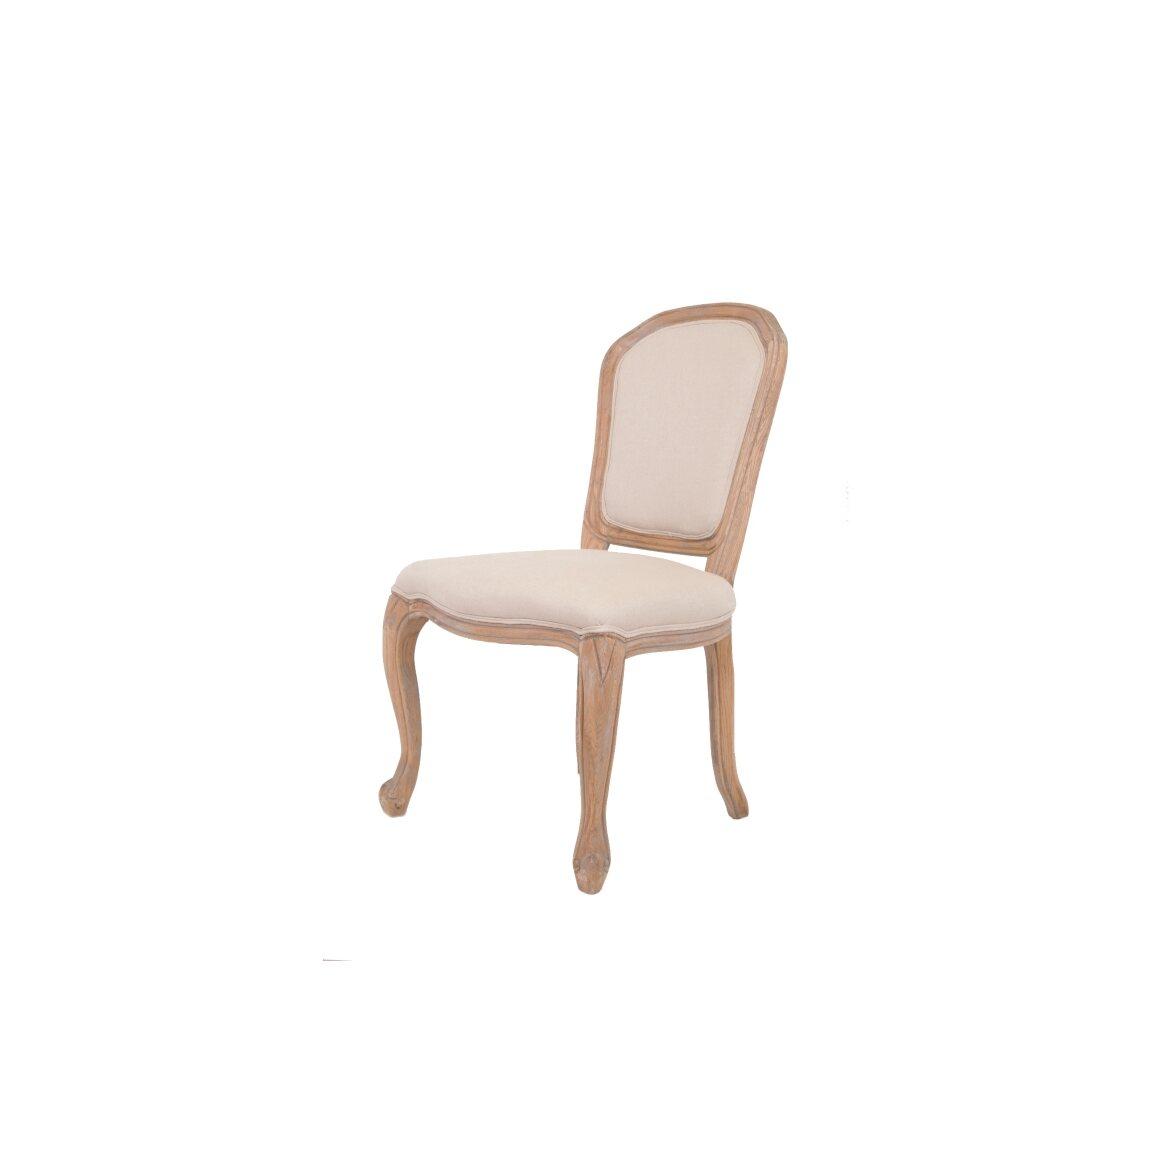 Стул Granes beige 4   Обеденные стулья Kingsby